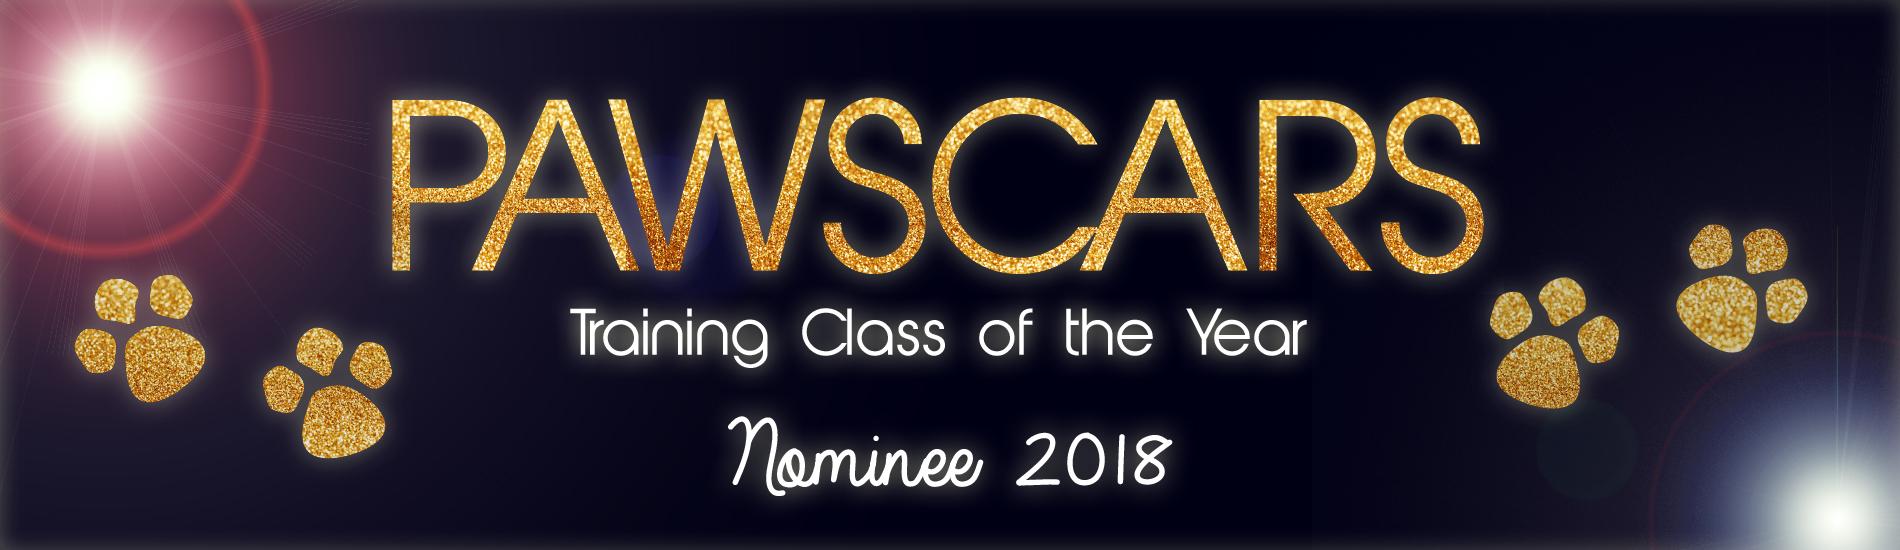 Pawscars Nominee 2018 Slider